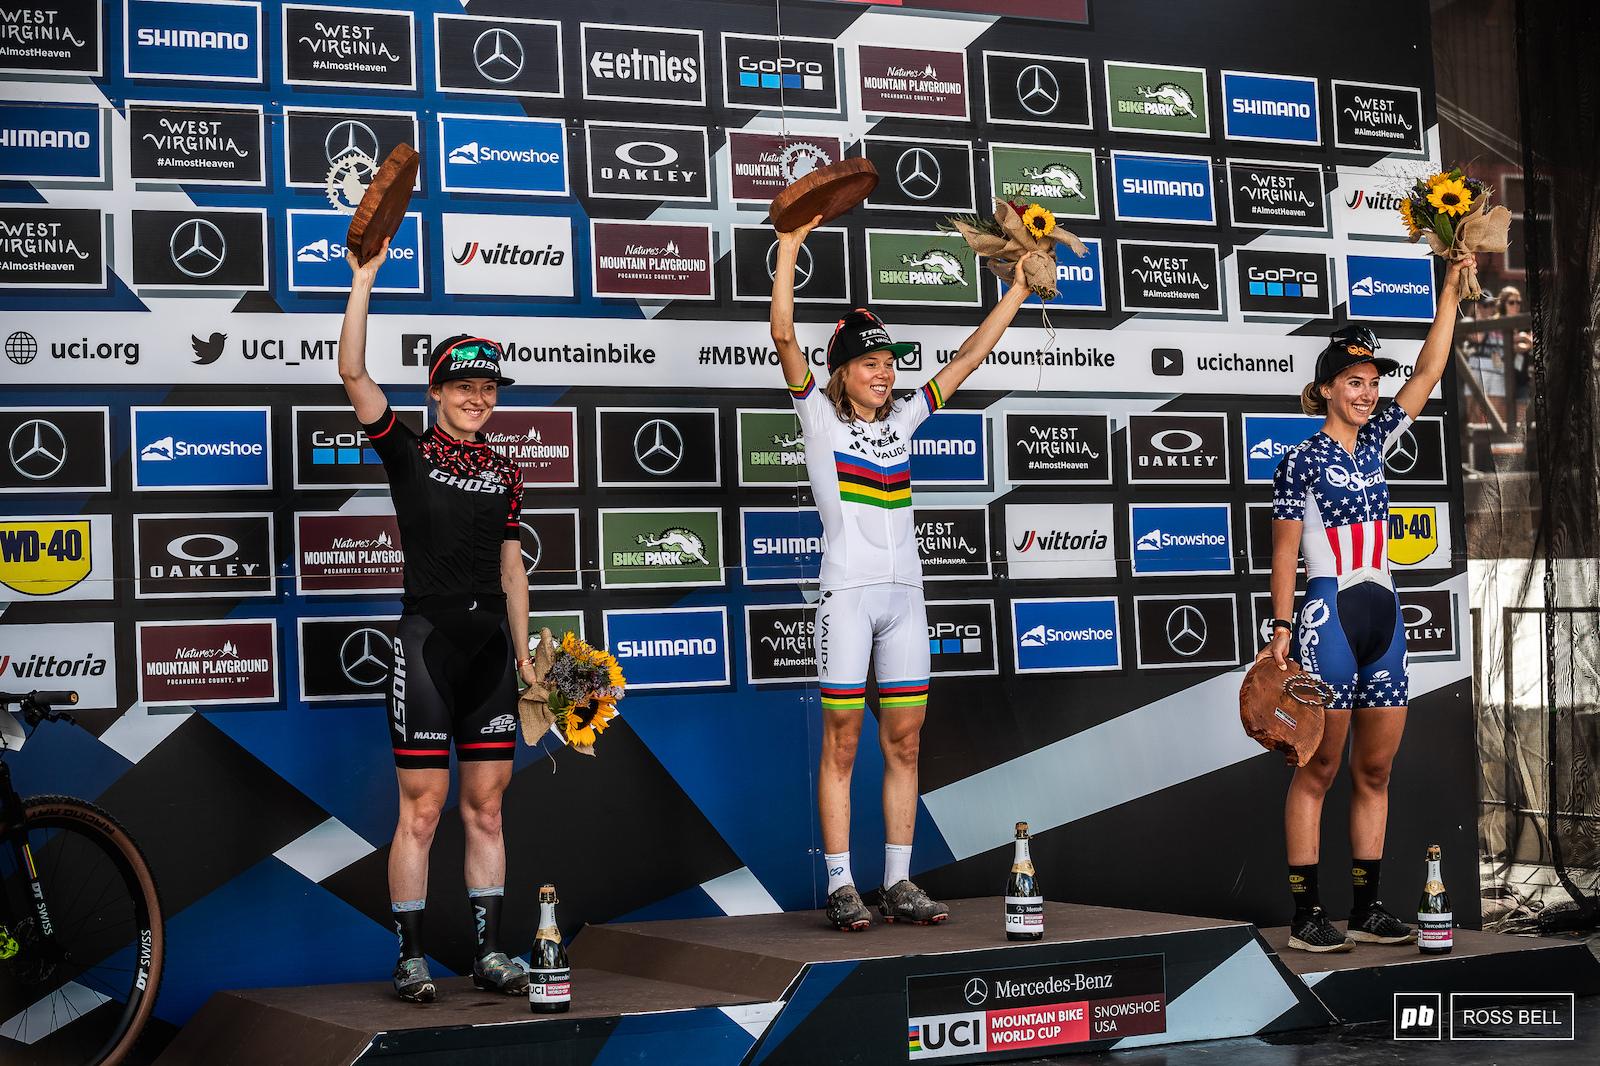 Mona Mitterwallner completes a perfect season as Caroline Bohe and Savilia Blunk round off the final junior women s podium of 2021.